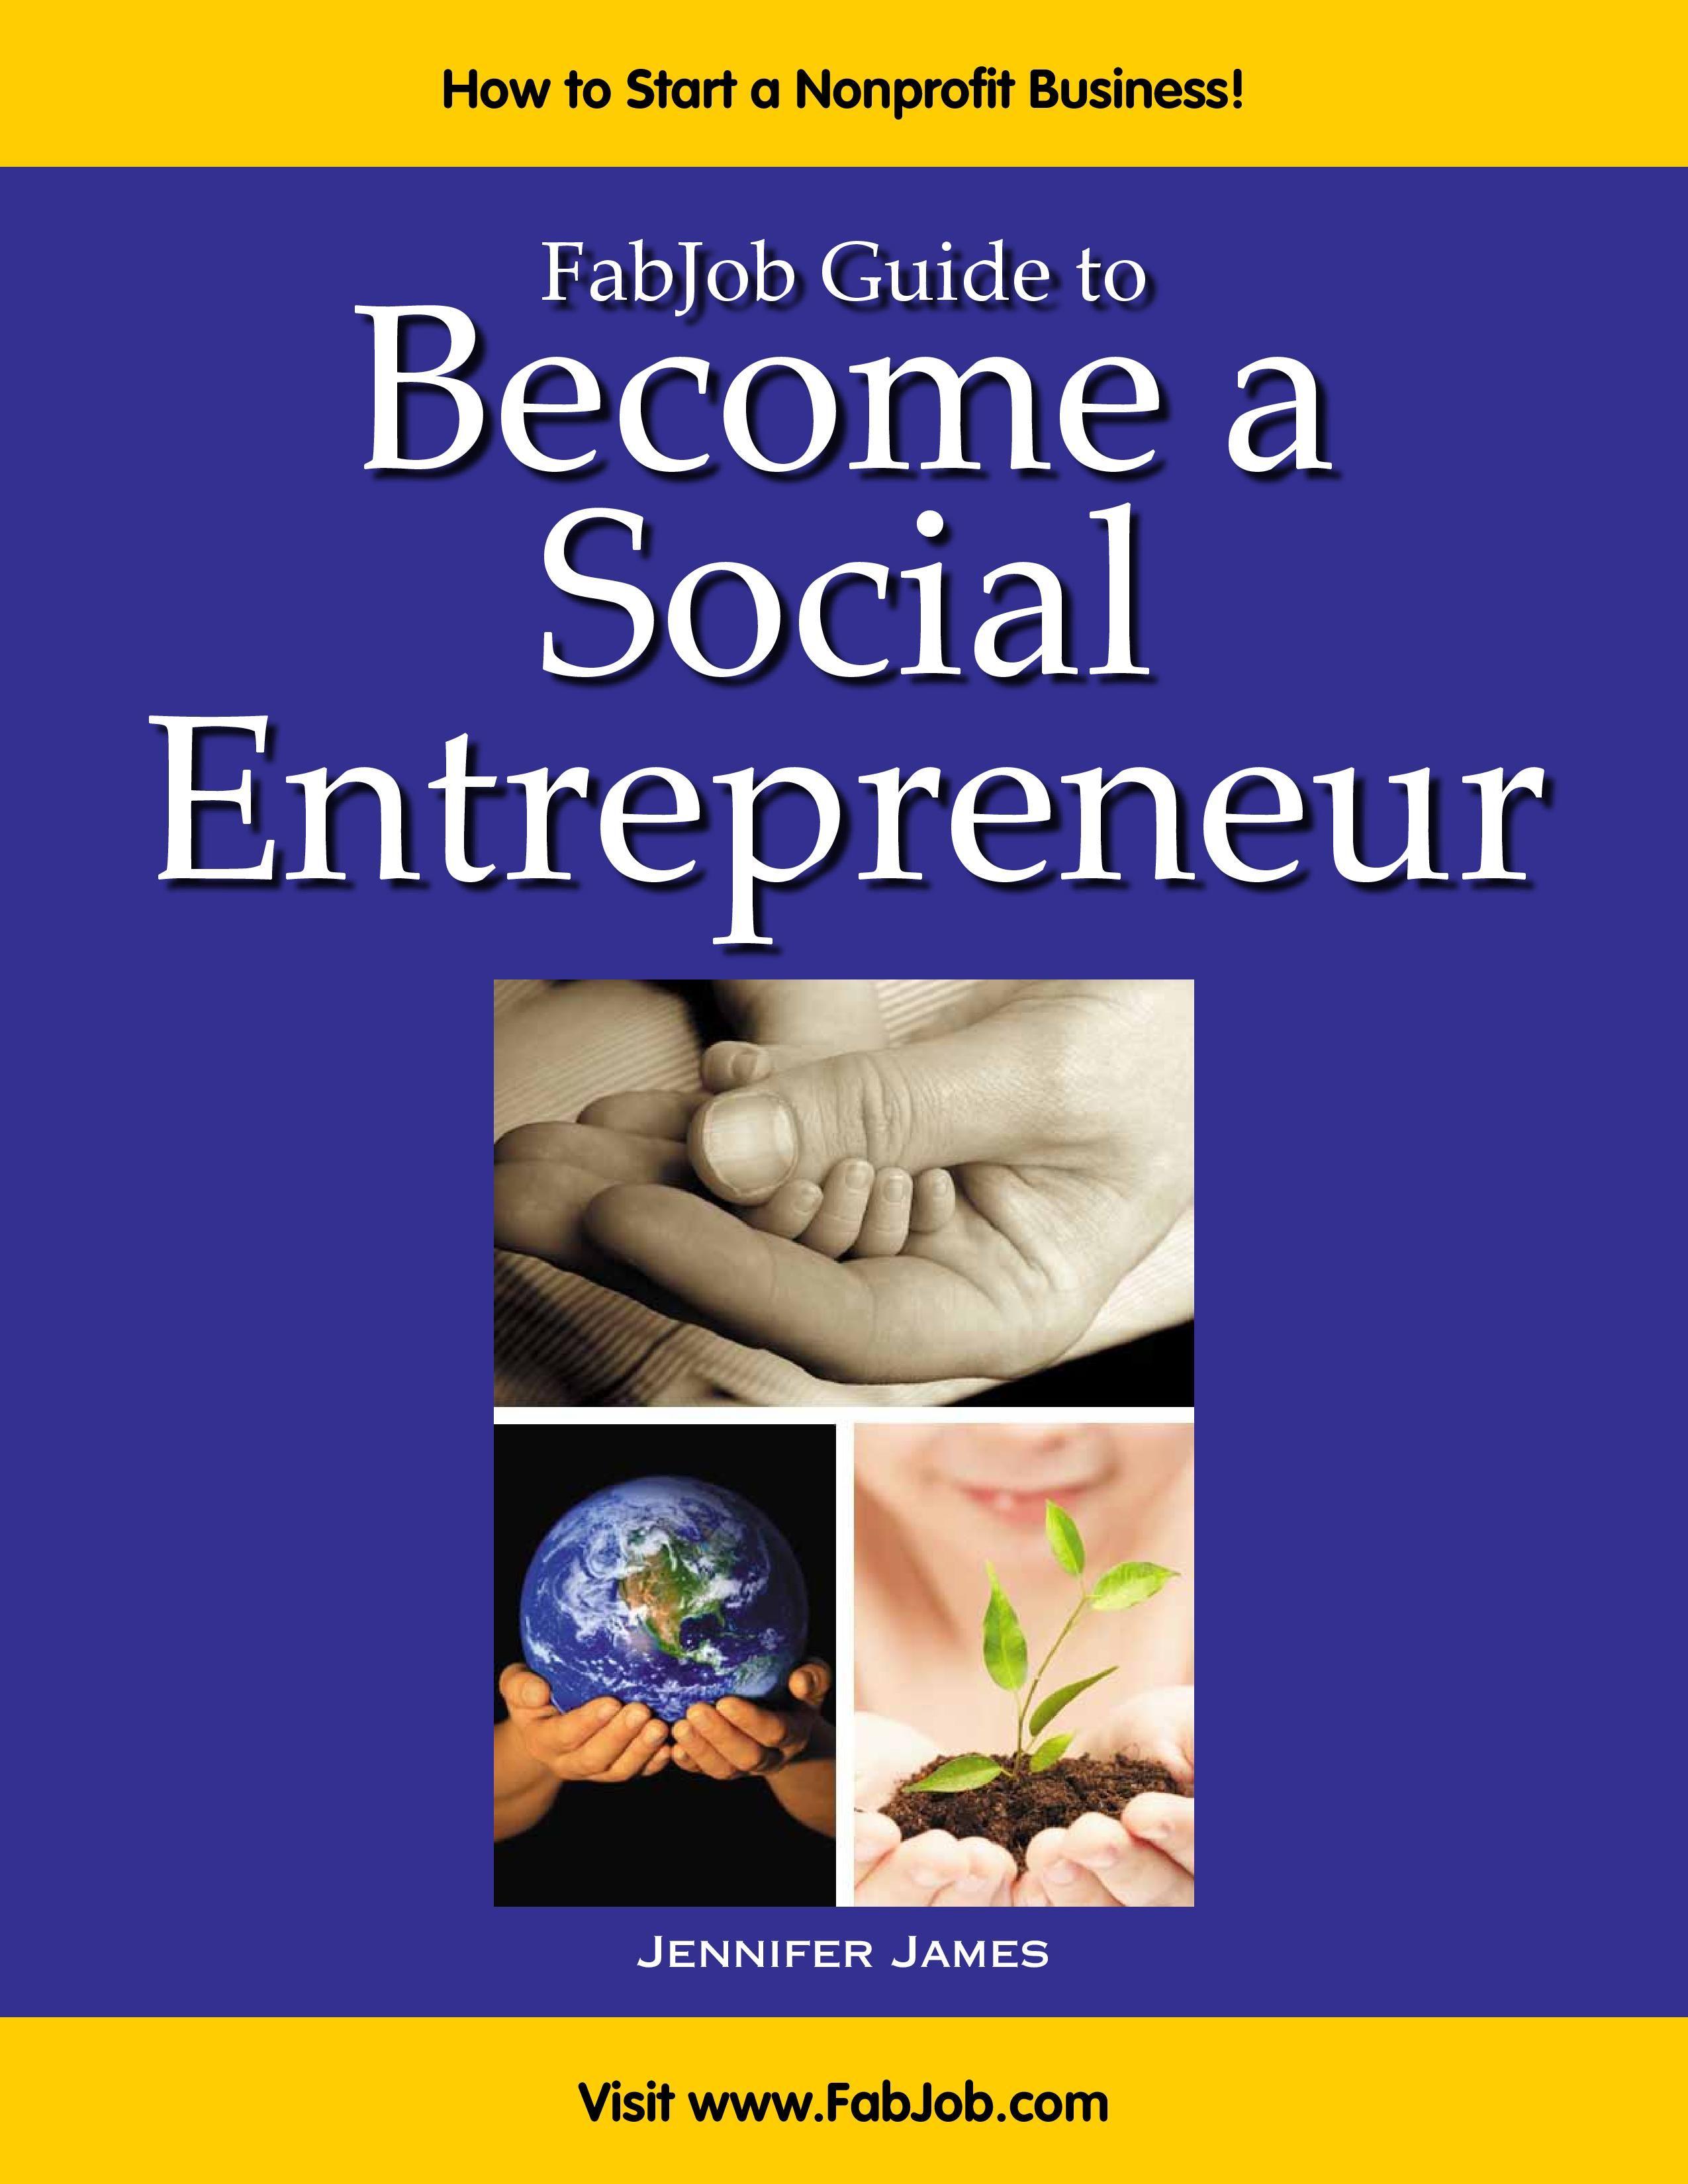 Fabjob guide array the fabjob guide to become a social entrepreneur entrepreneur rh pinterest fandeluxe Choice Image